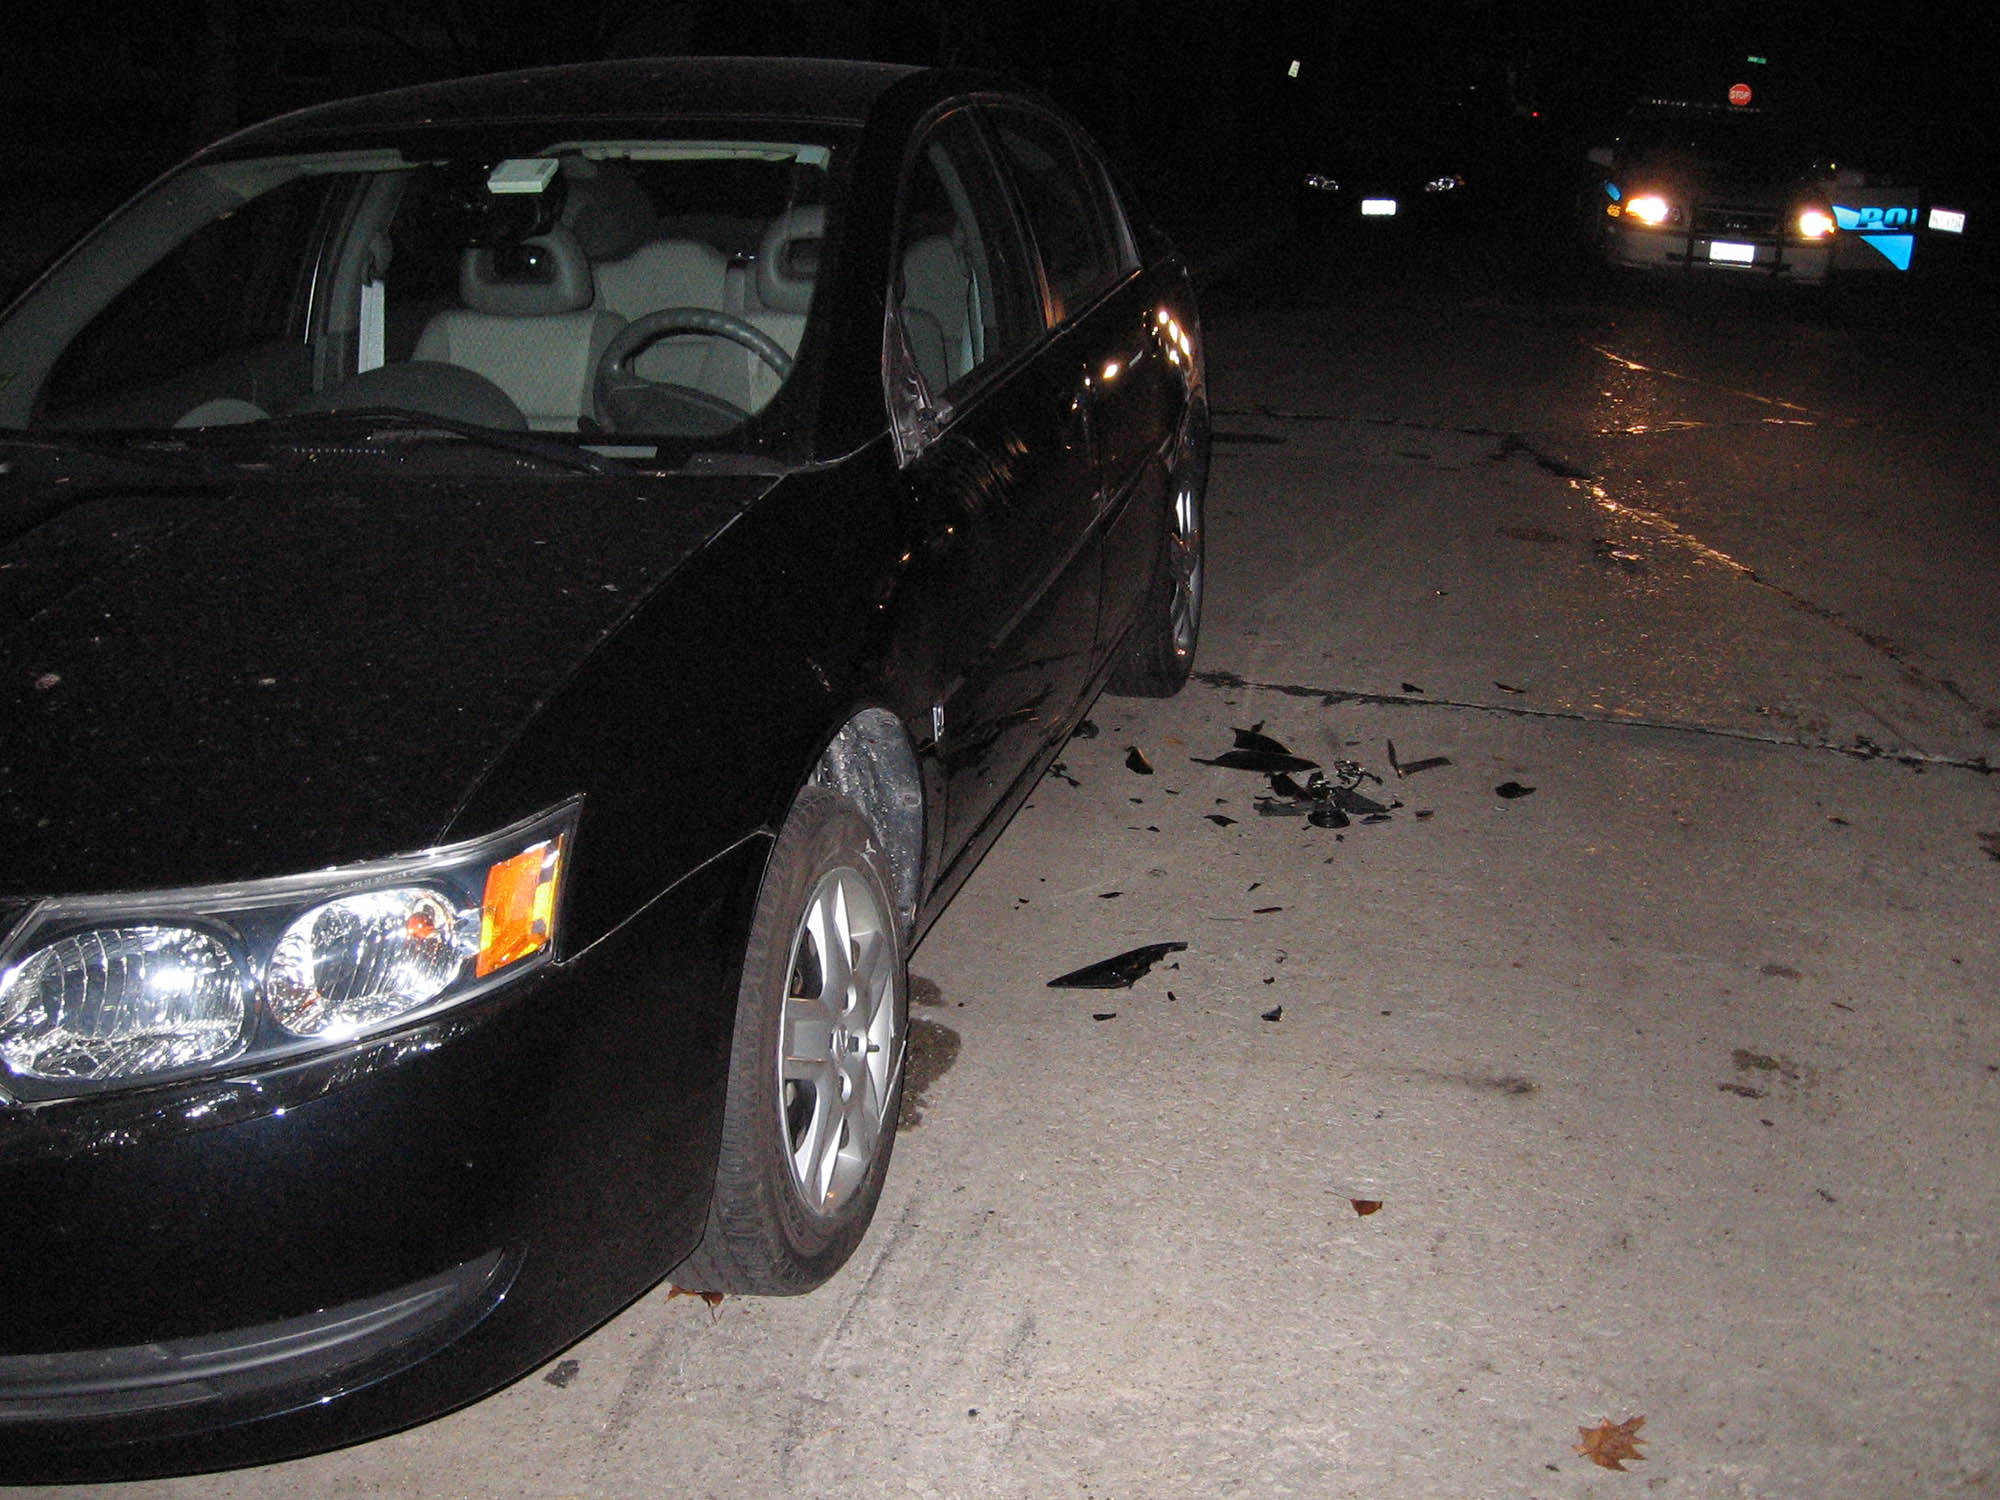 My car got hit by a drunk driver